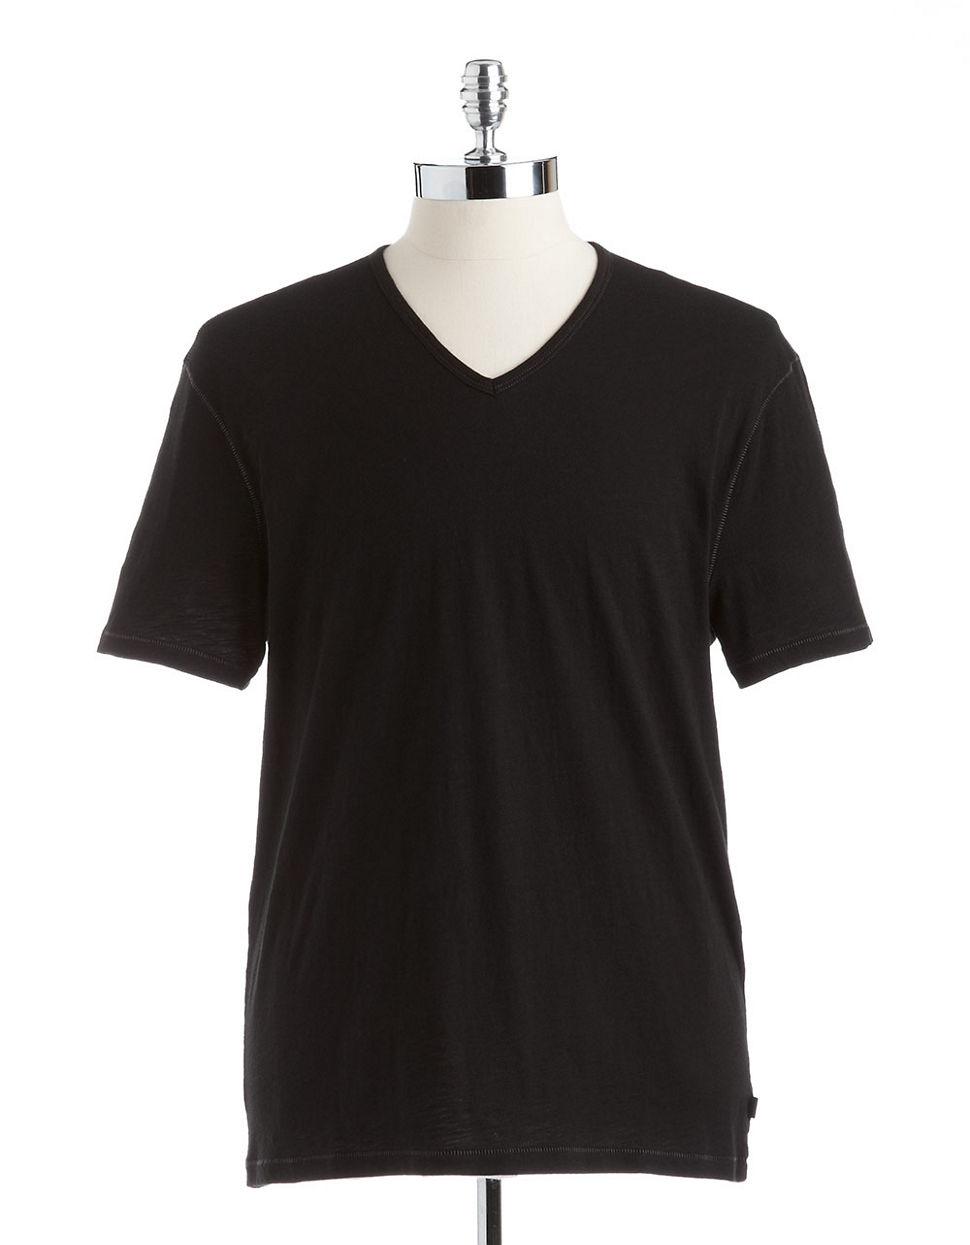 john varvatos cotton v neck t shirt in black for men lyst